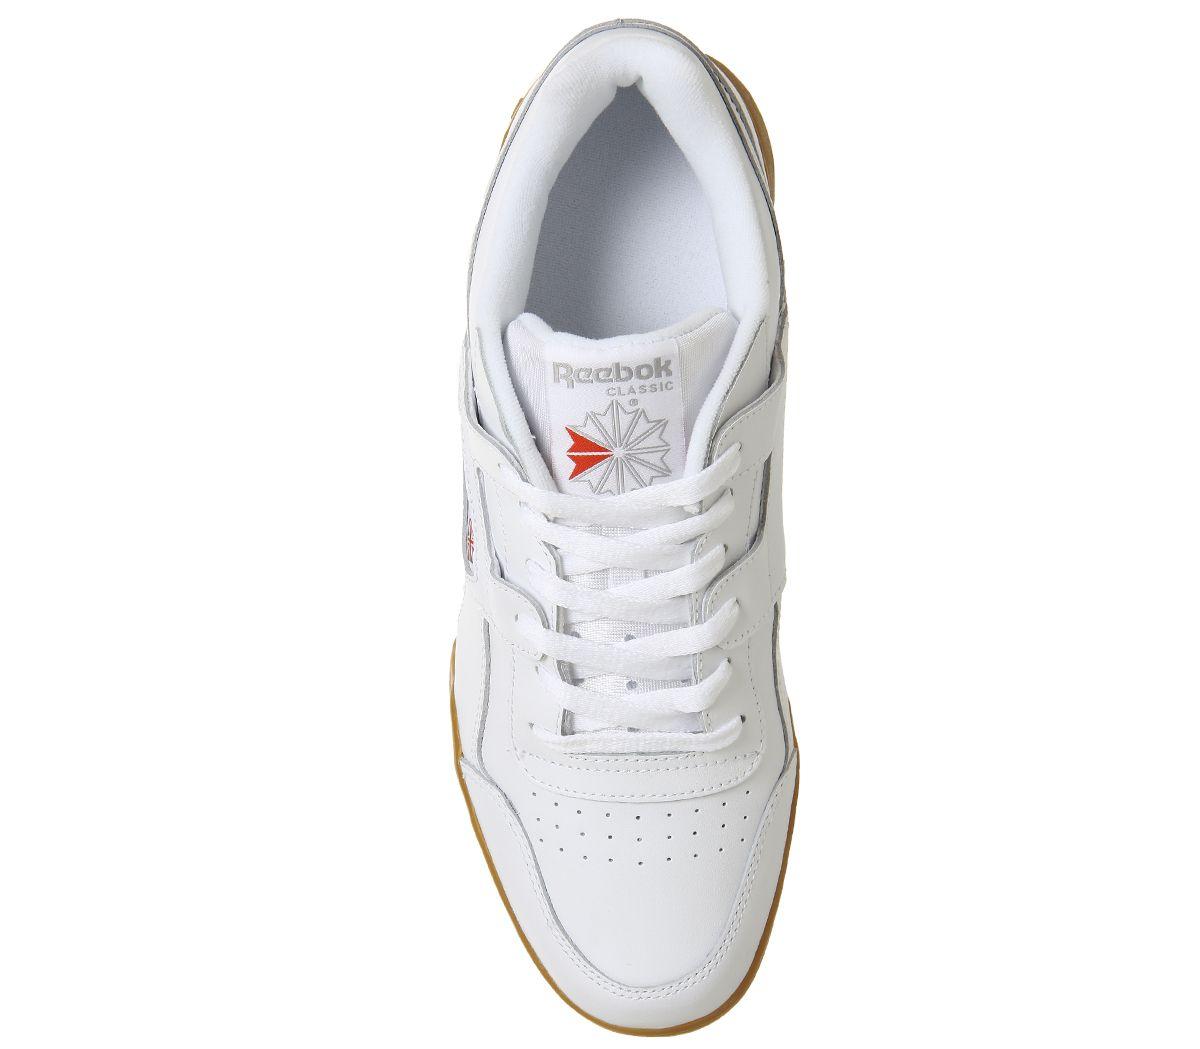 Reebok Entraînement Plus Chaussures blanches Carbone gomme Baskets UK 4